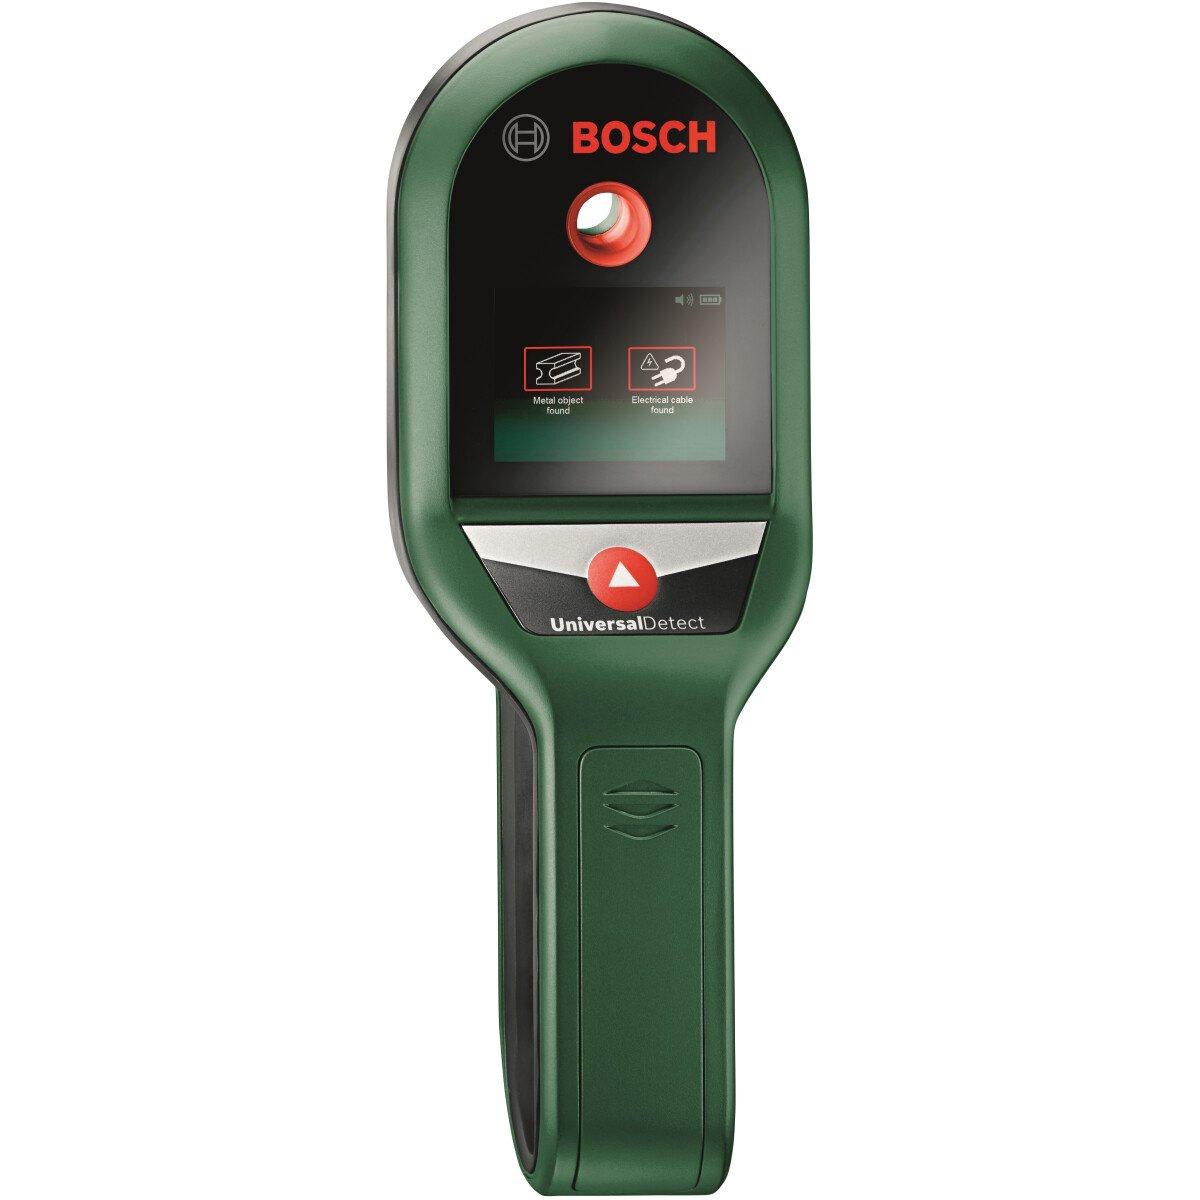 Bosch UNIDET UniversalDetect Digital Detector